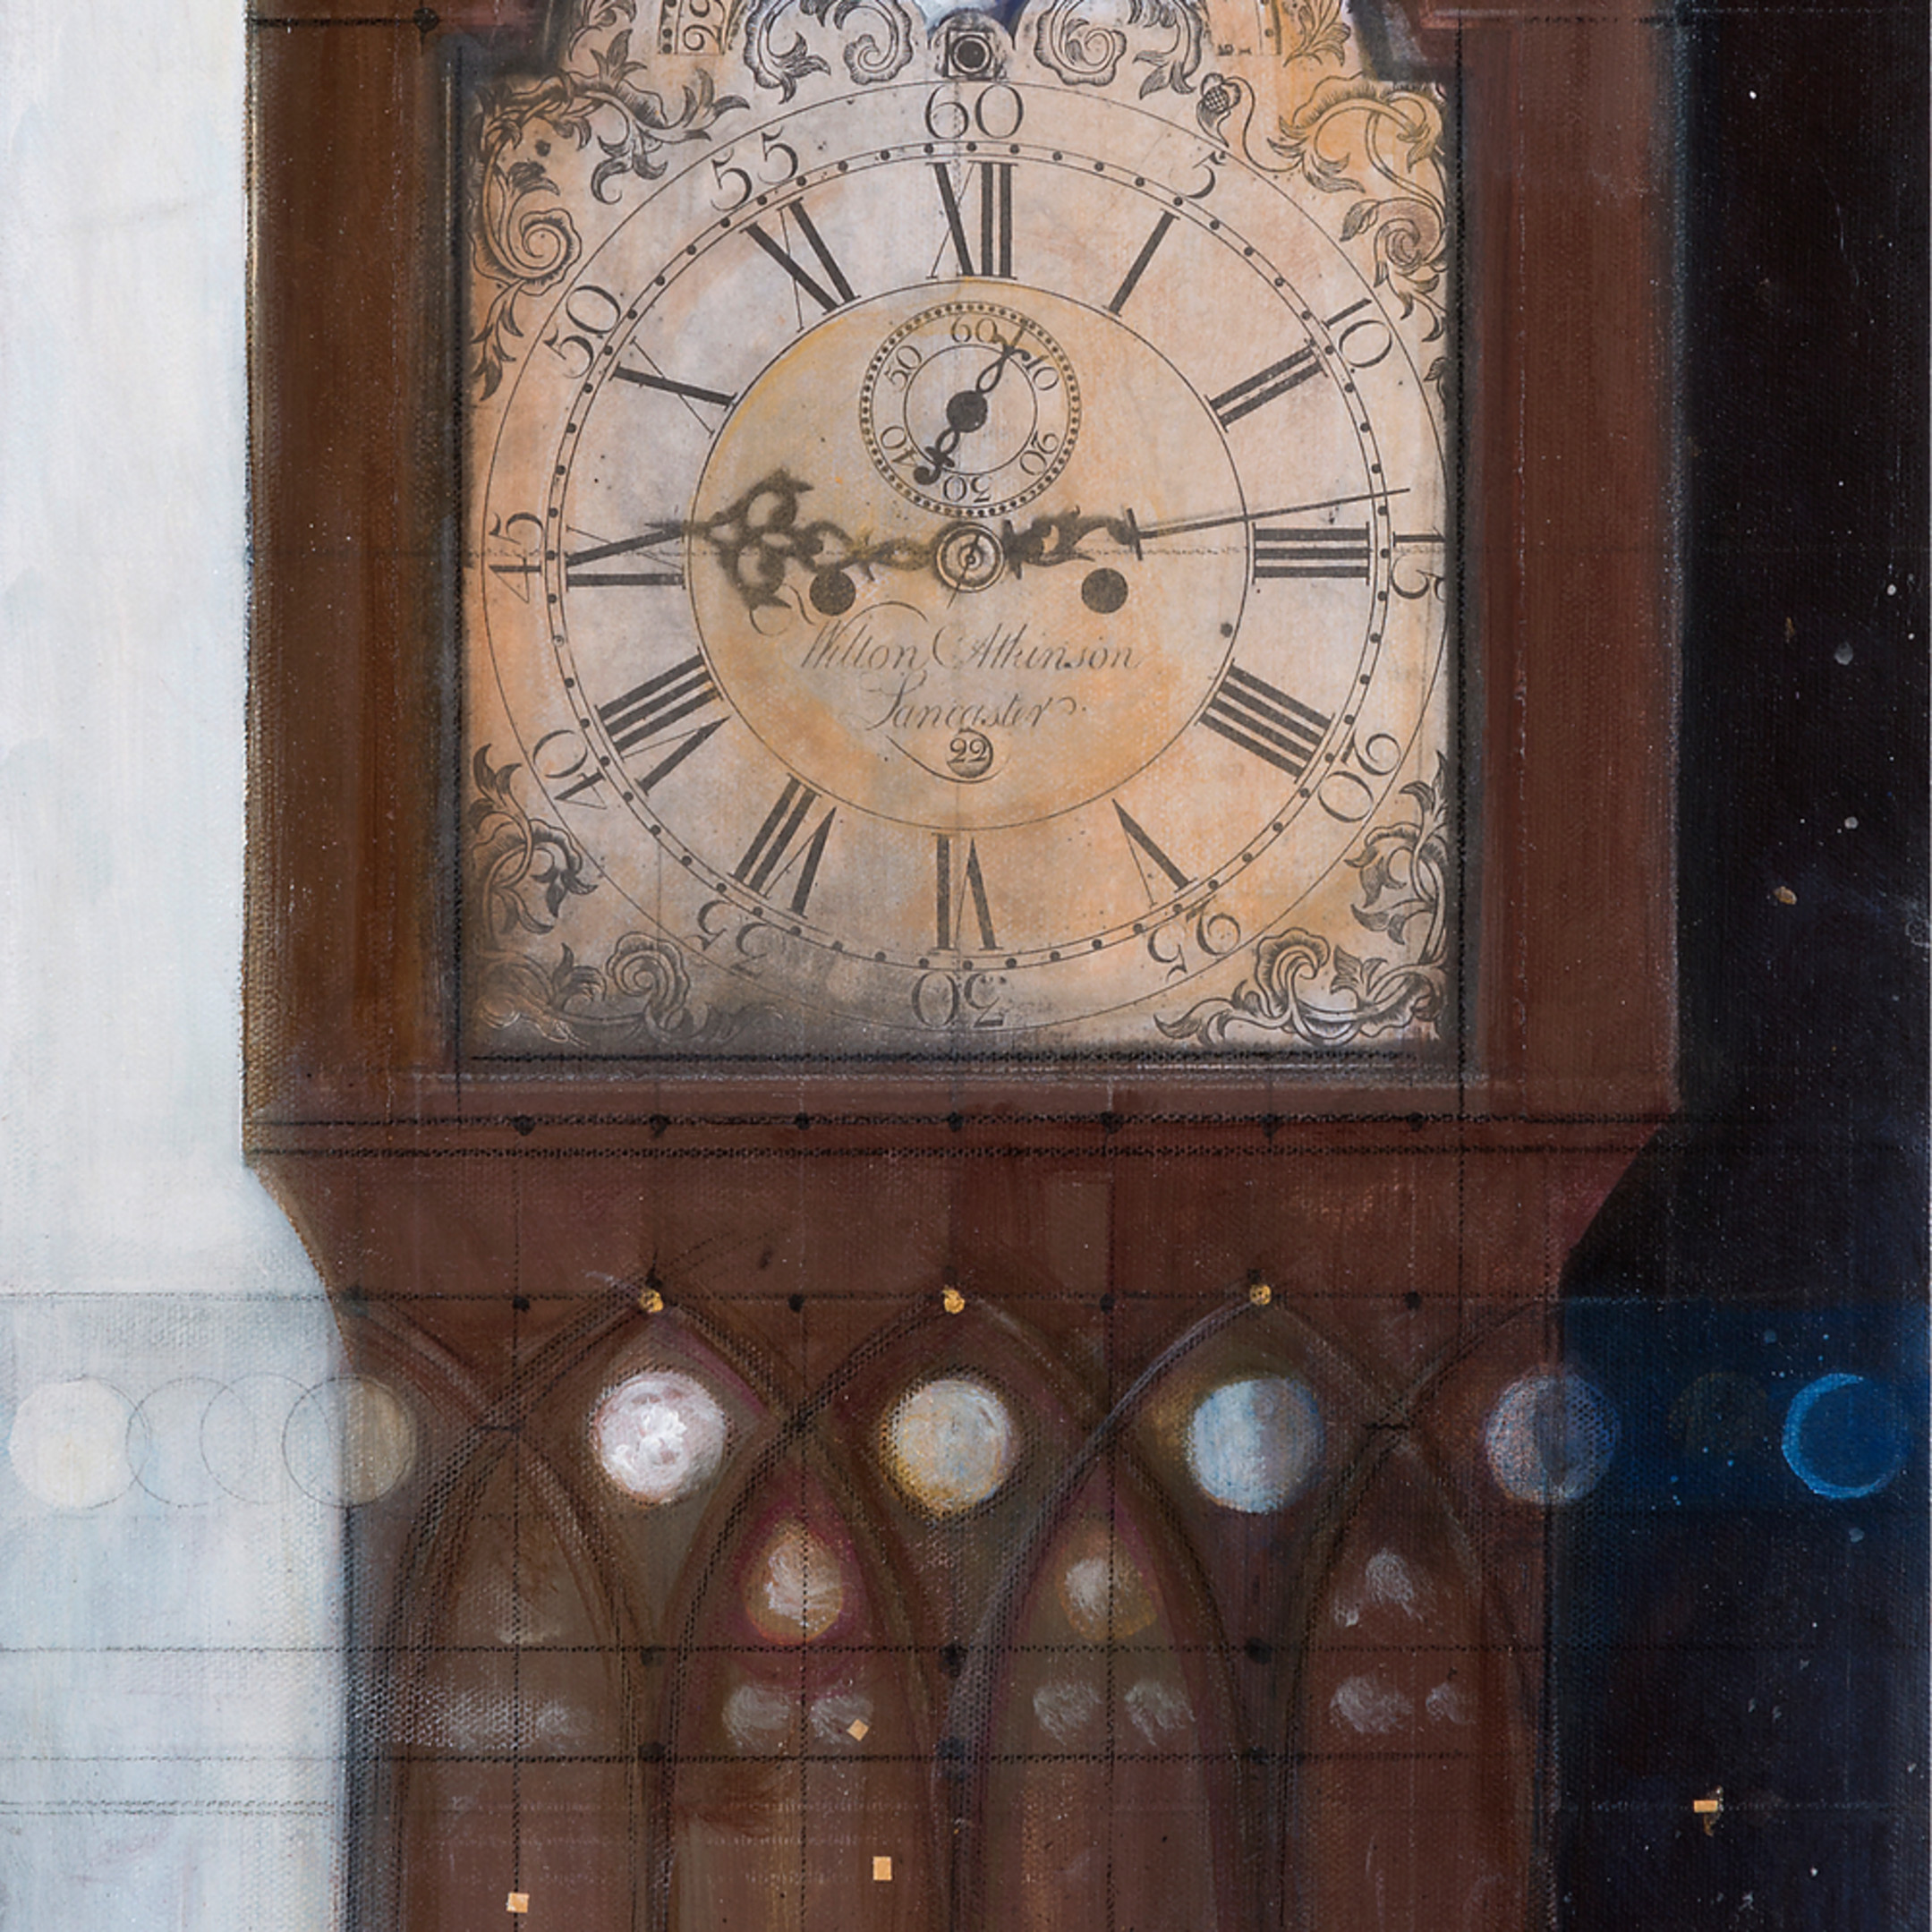 Timepiecenightday uhjpxy